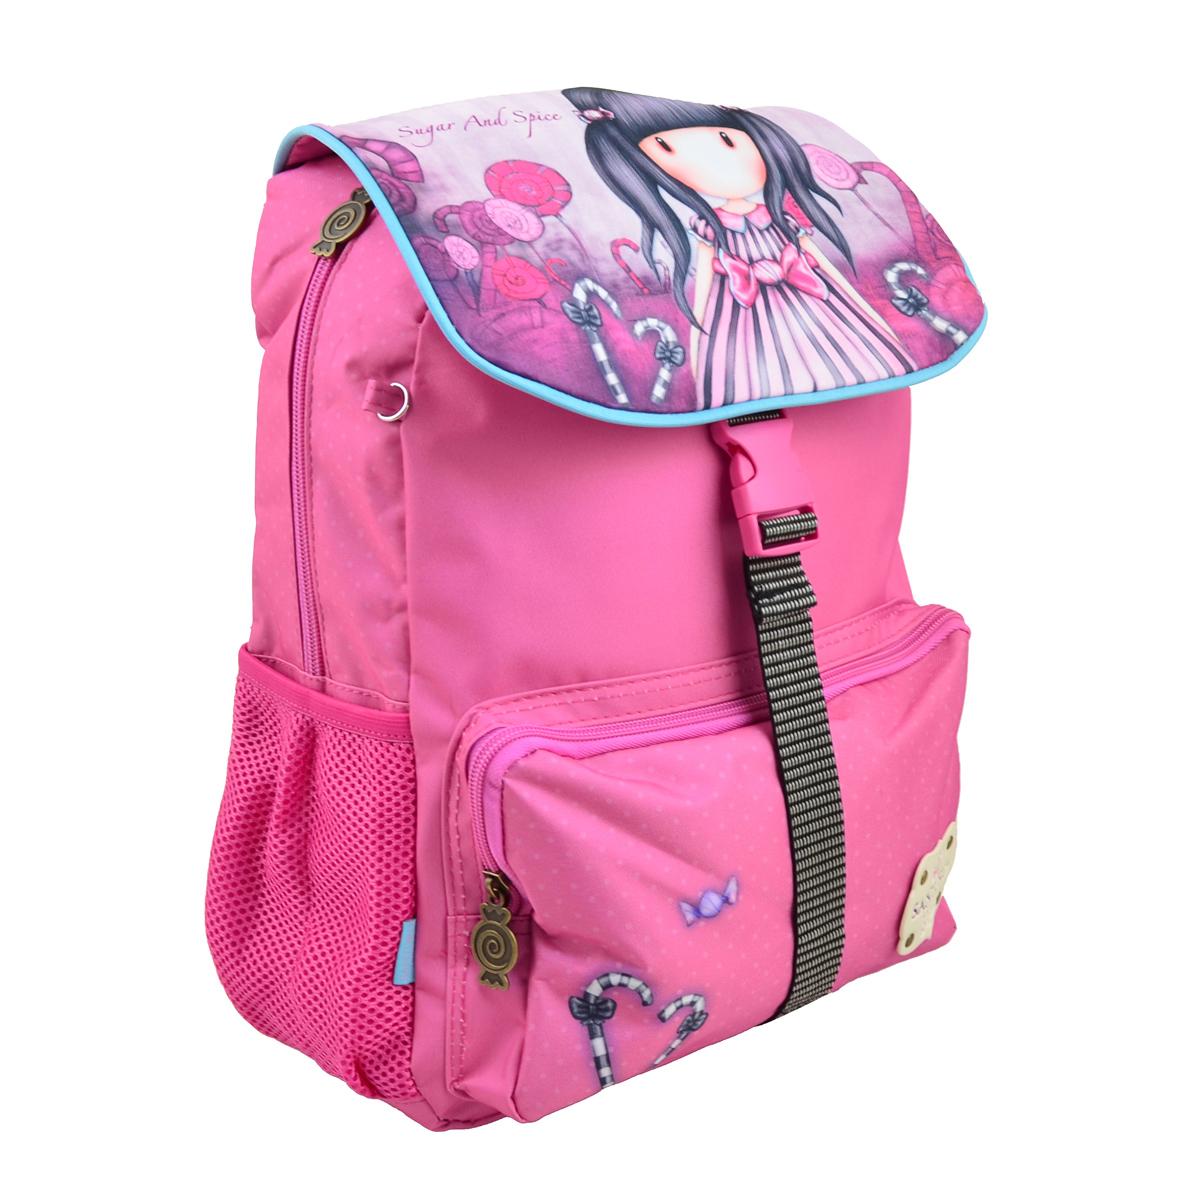 Рюкзак Santoro Candy, 30х29х9